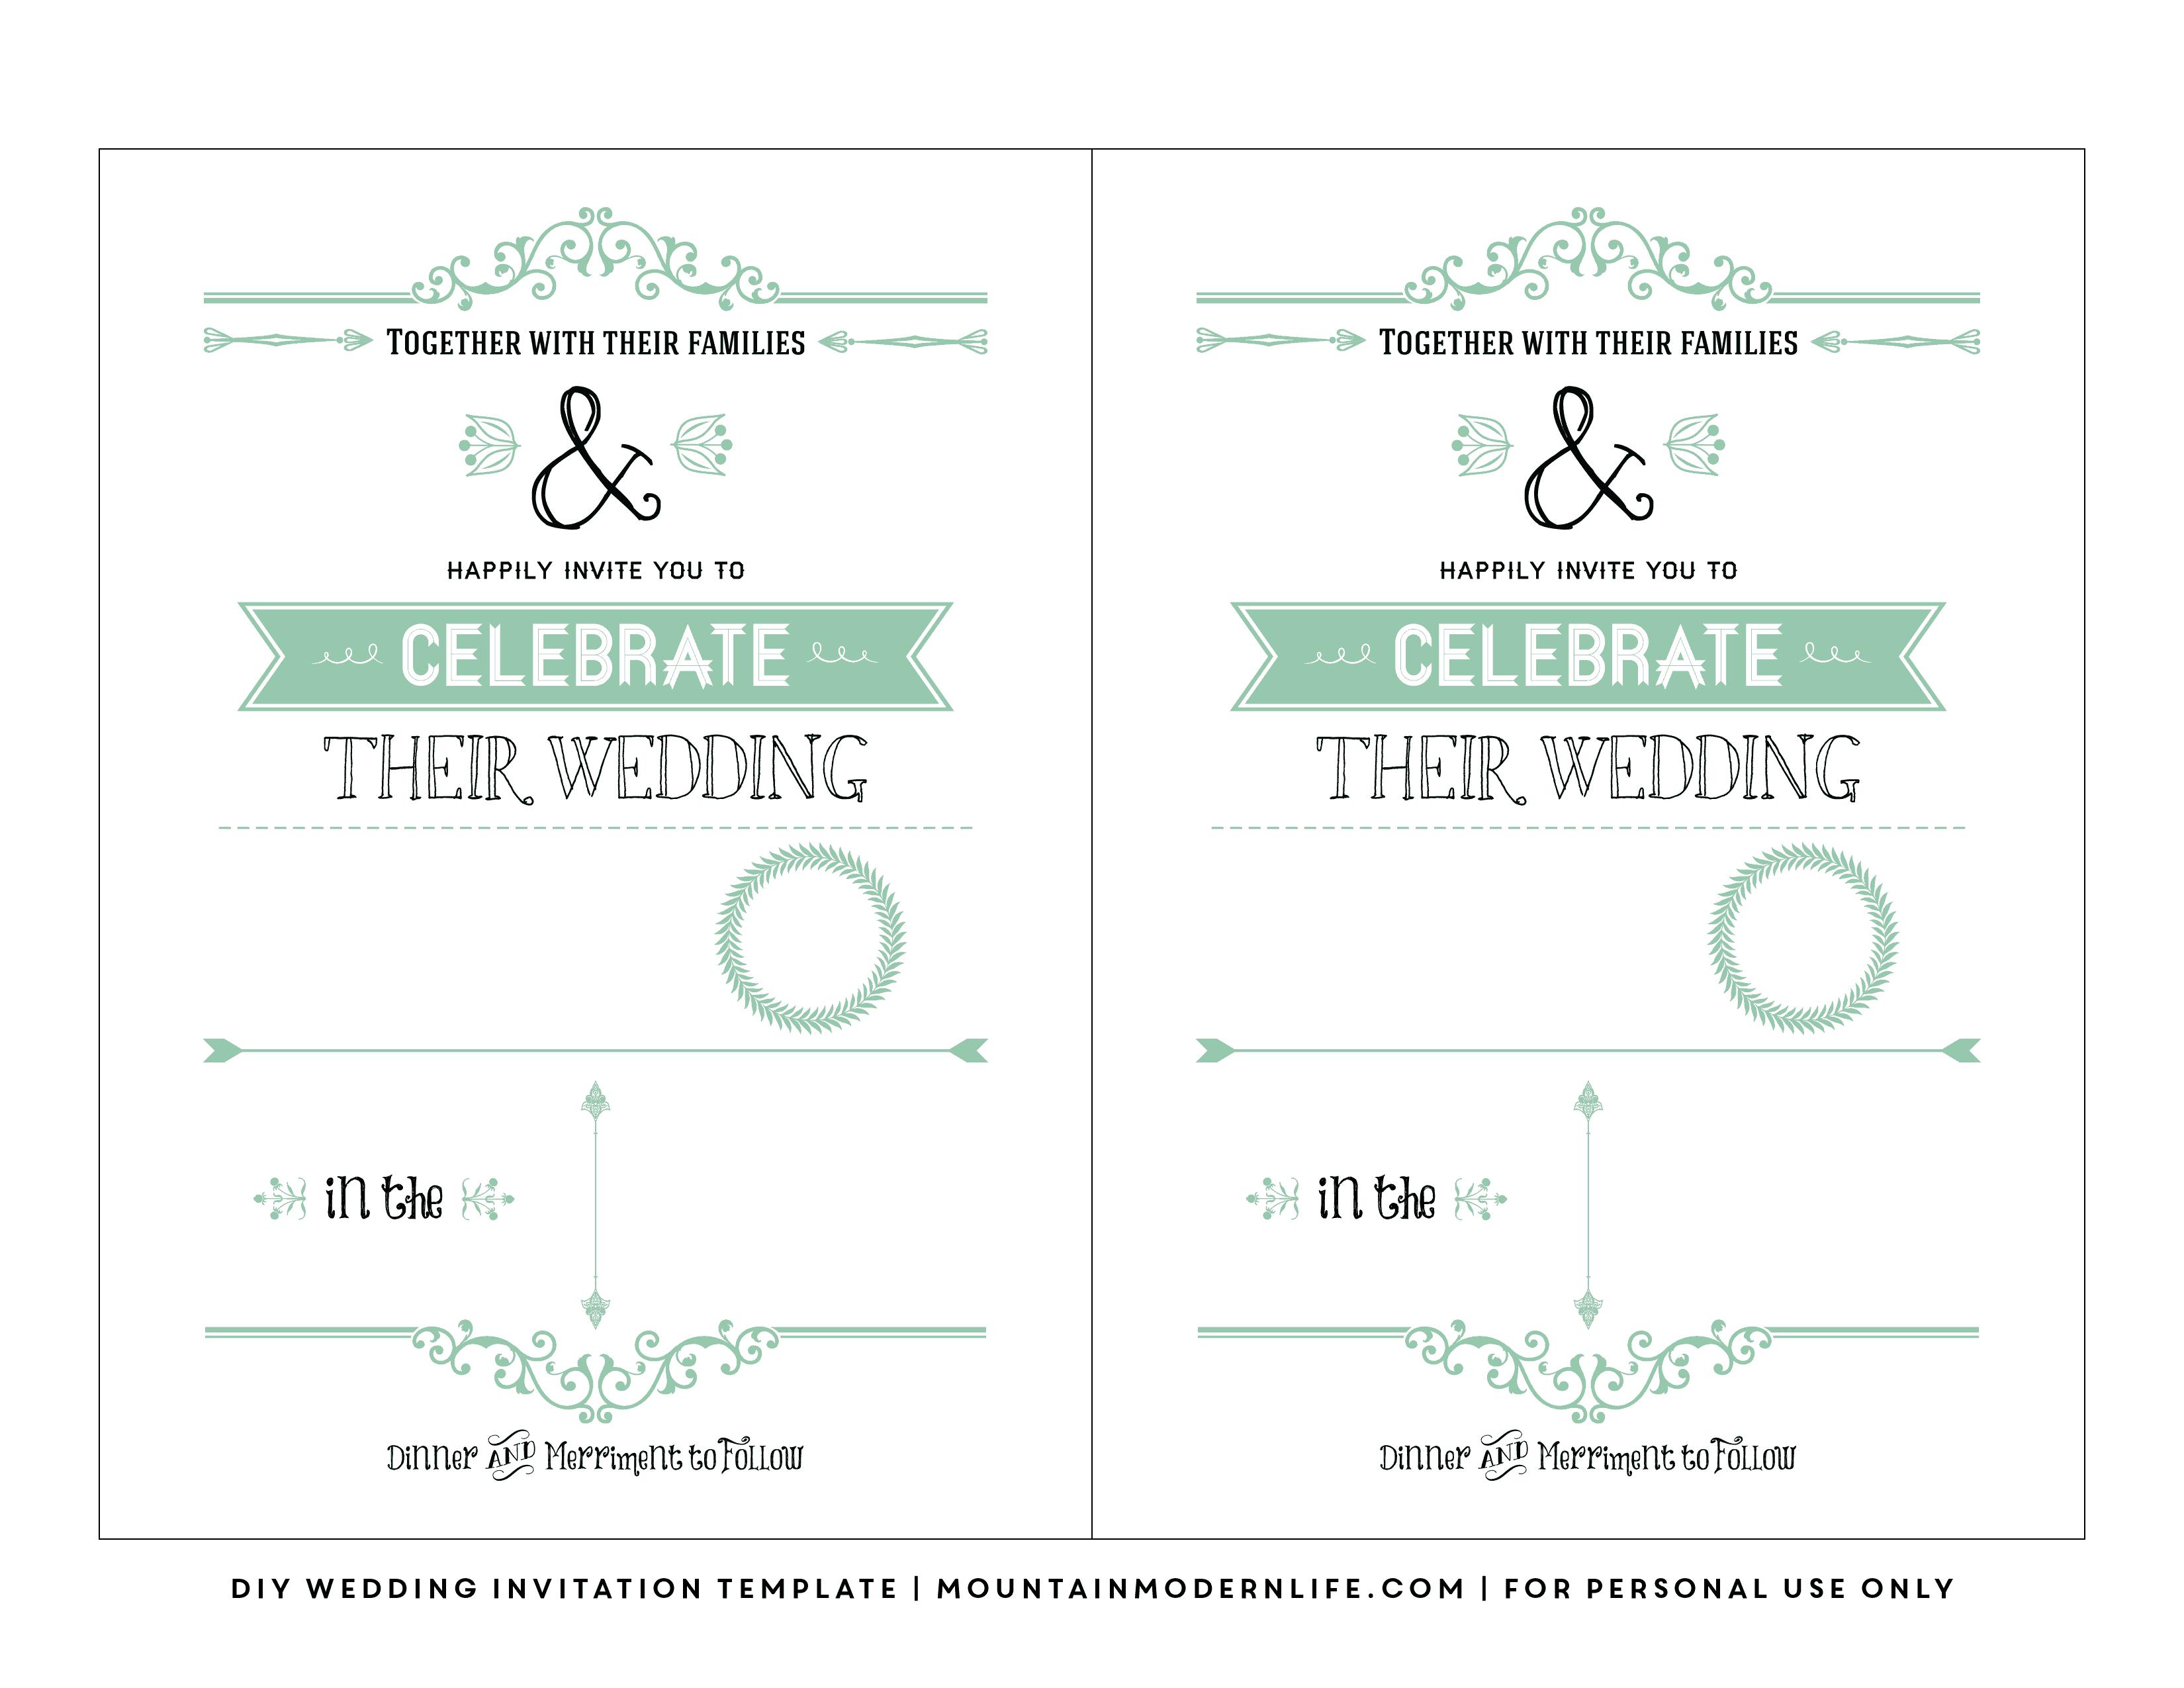 Free Wedding Invitation Template   Mountainmodernlife - Free Printable Wedding Invitations